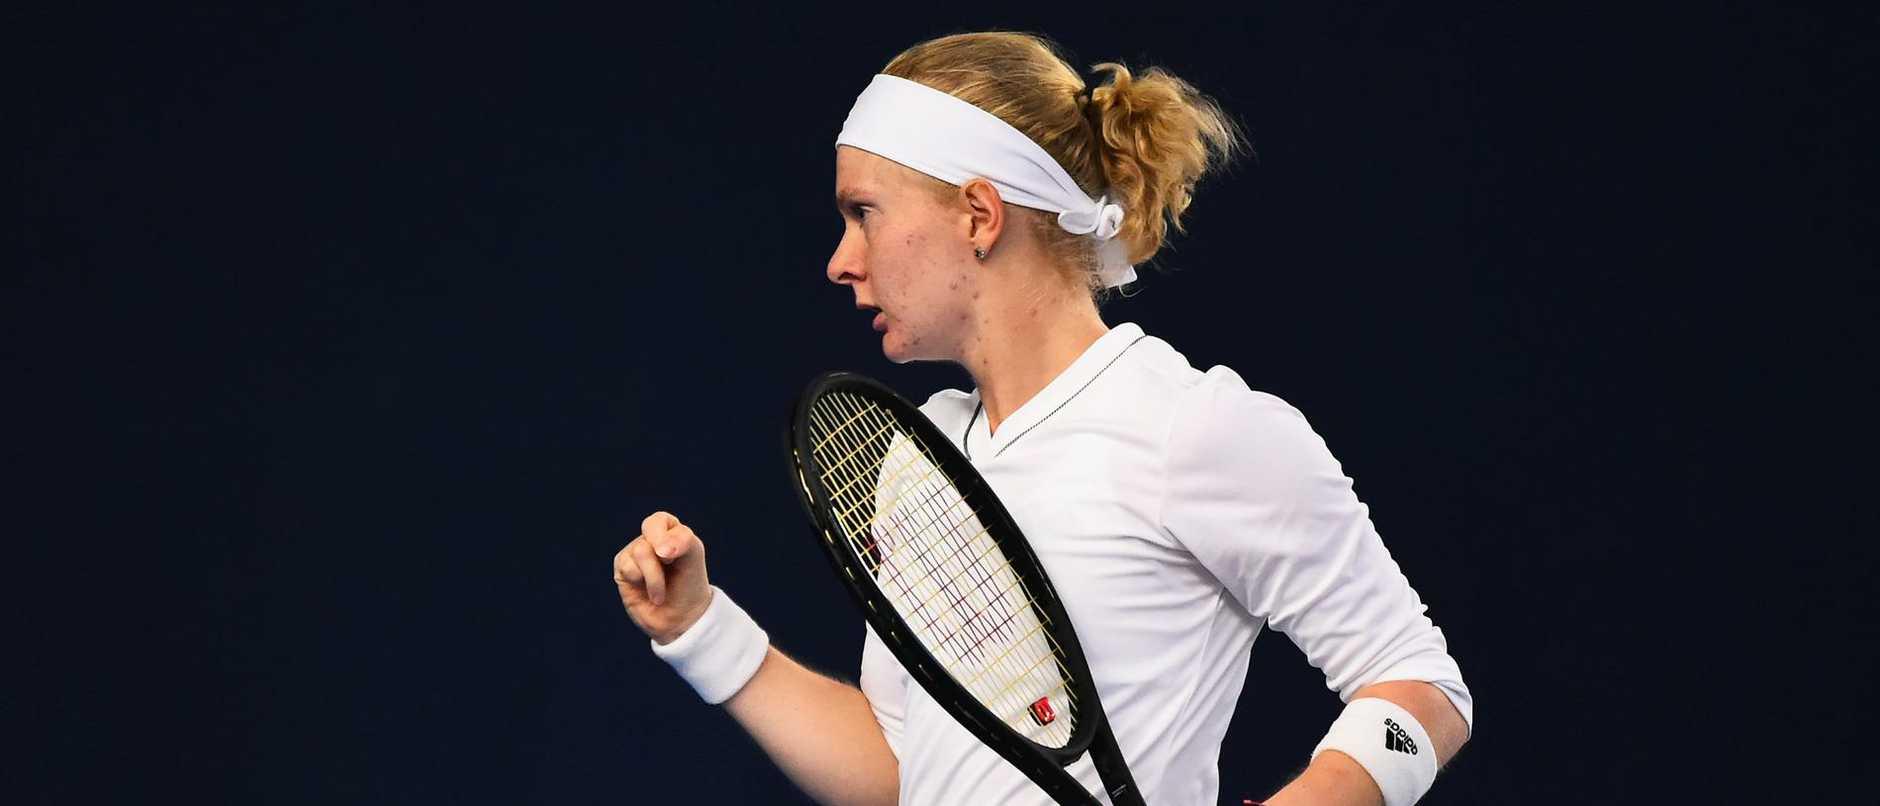 British qualifier Francesca Jones overcomes rare condition to fulfil her tennis dream